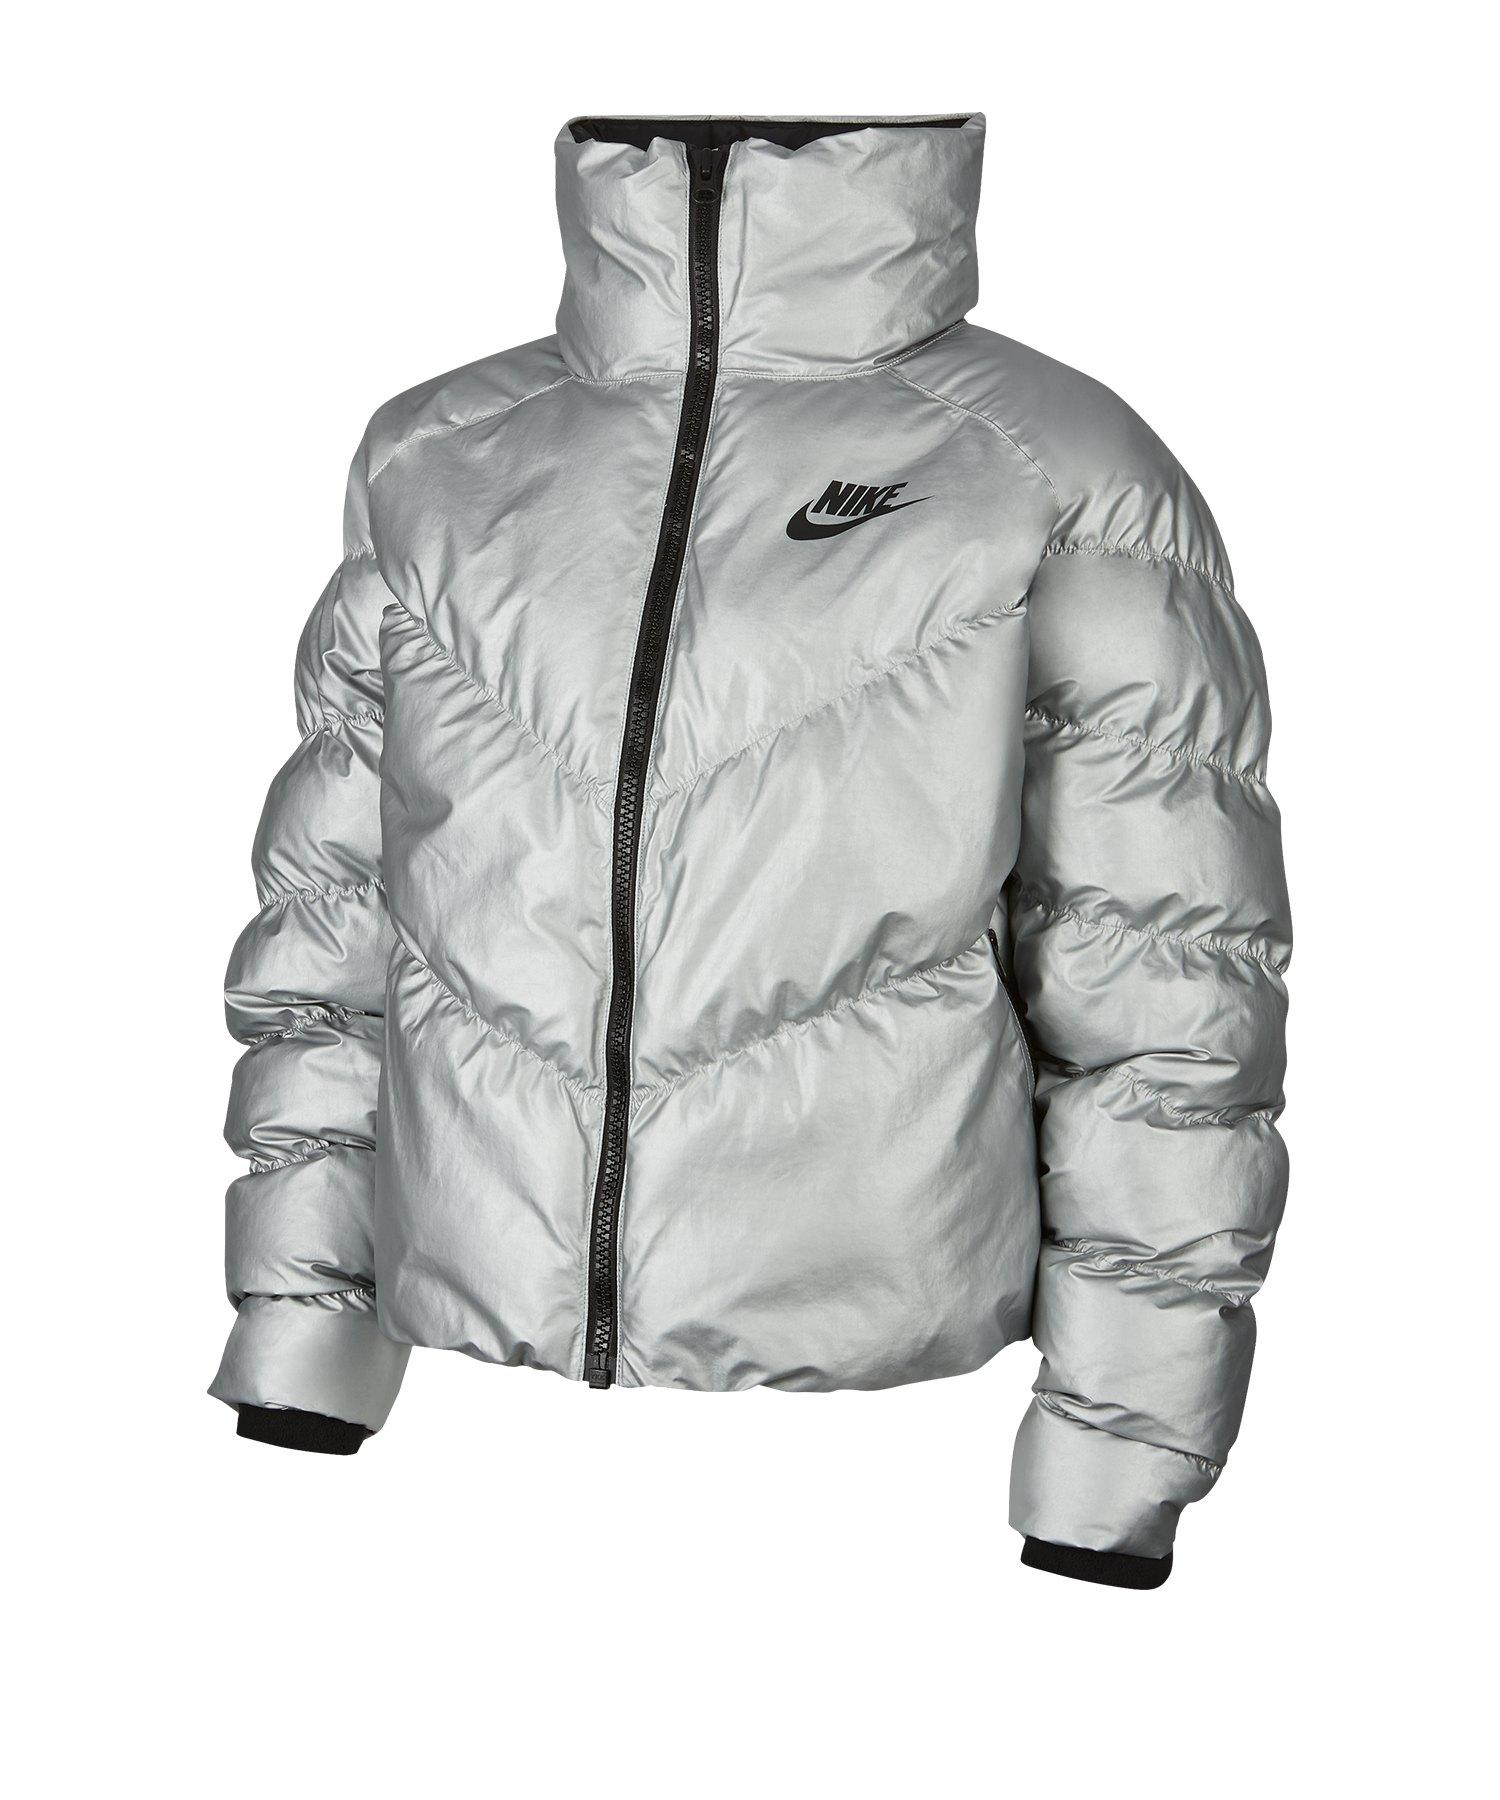 Nike Winterjacke Damen Grau F095 - grau